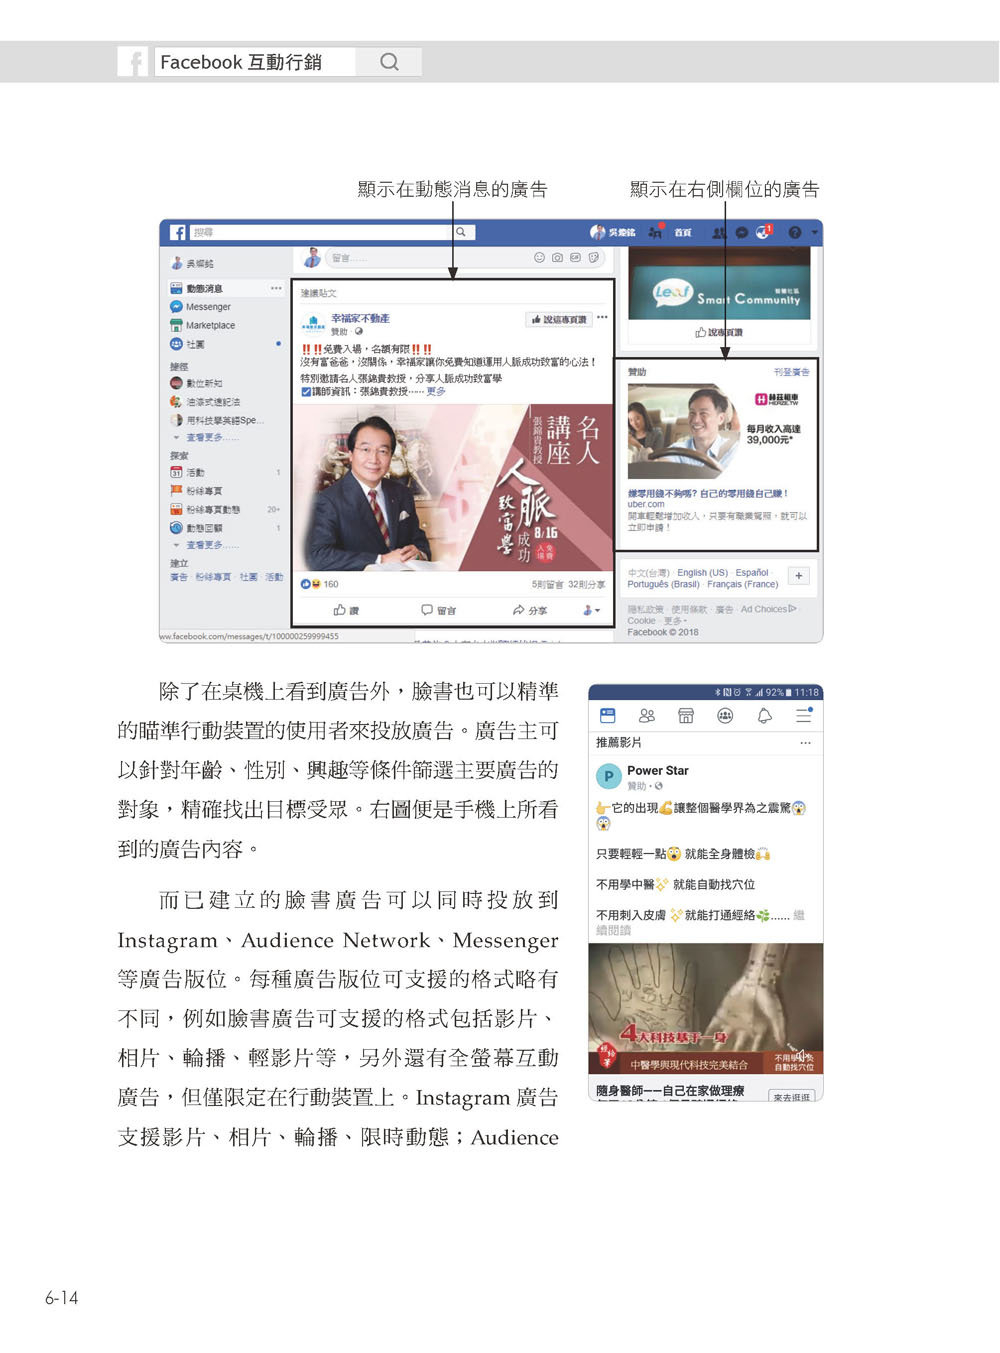 Facebook 互動行銷:社群口碑經營新思路+廣告投放如何有成效,想做好臉書行銷,操作心法就在這!-preview-44